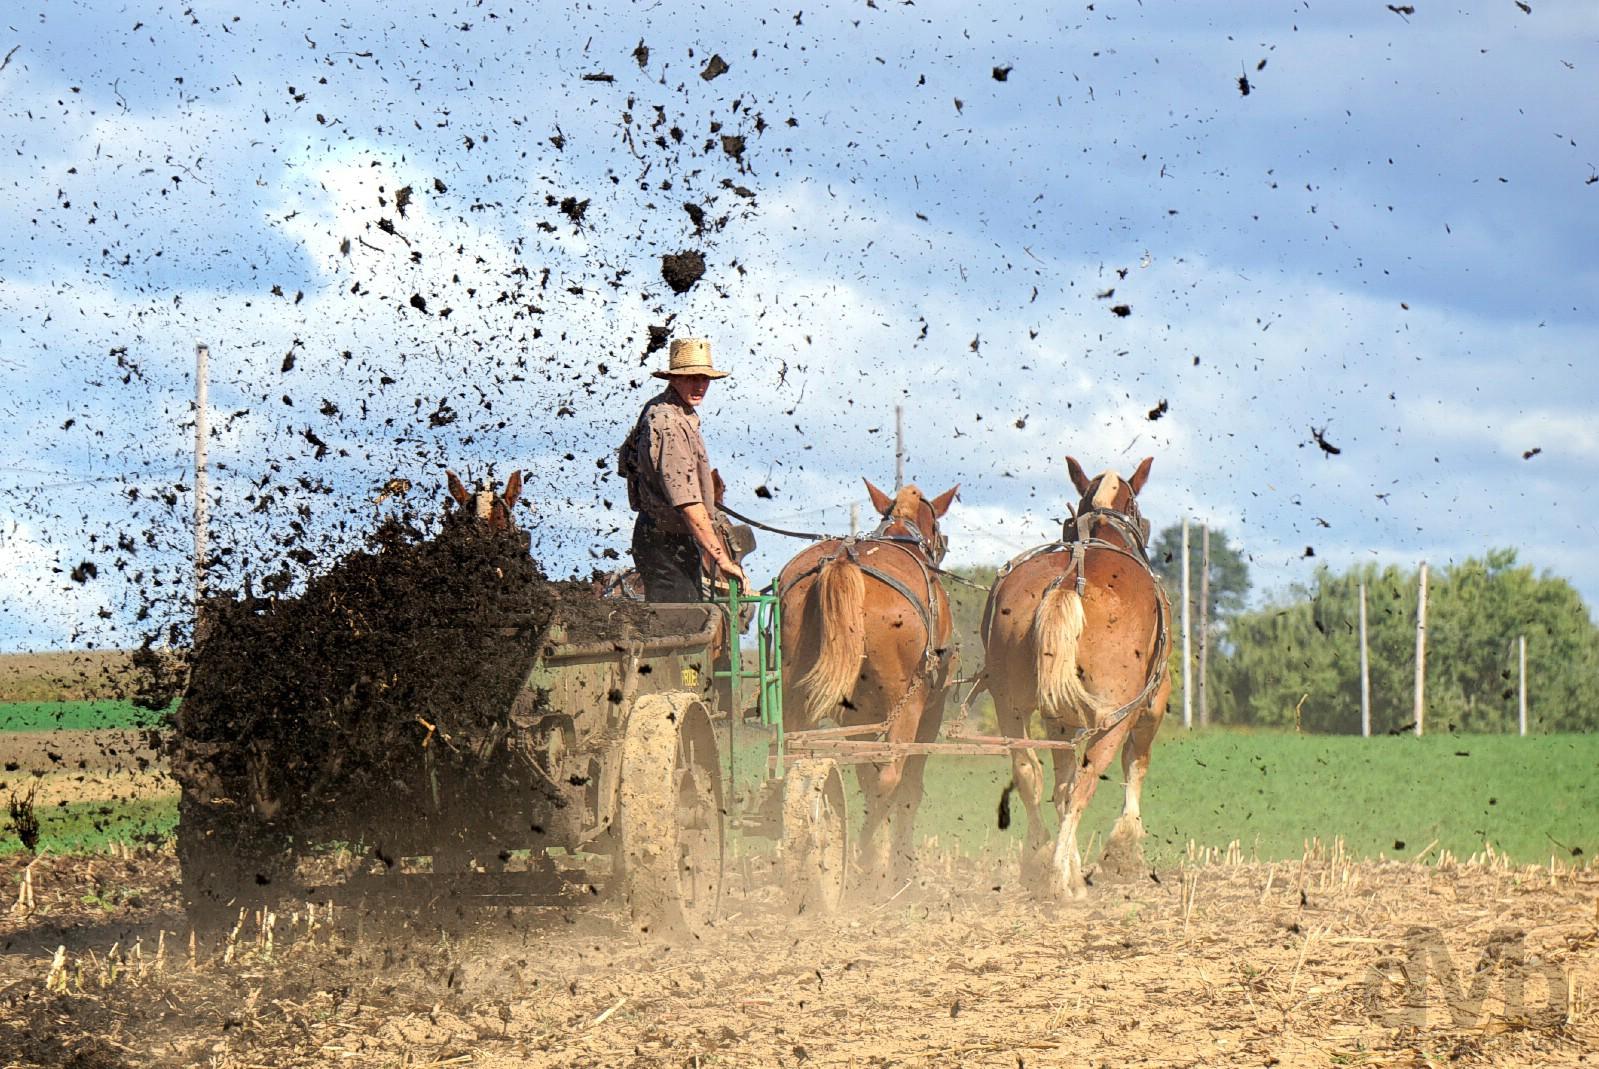 Amish farming outside Bird in Hand, Lancaster County, Pennsylvania, USA. September 30, 2017.